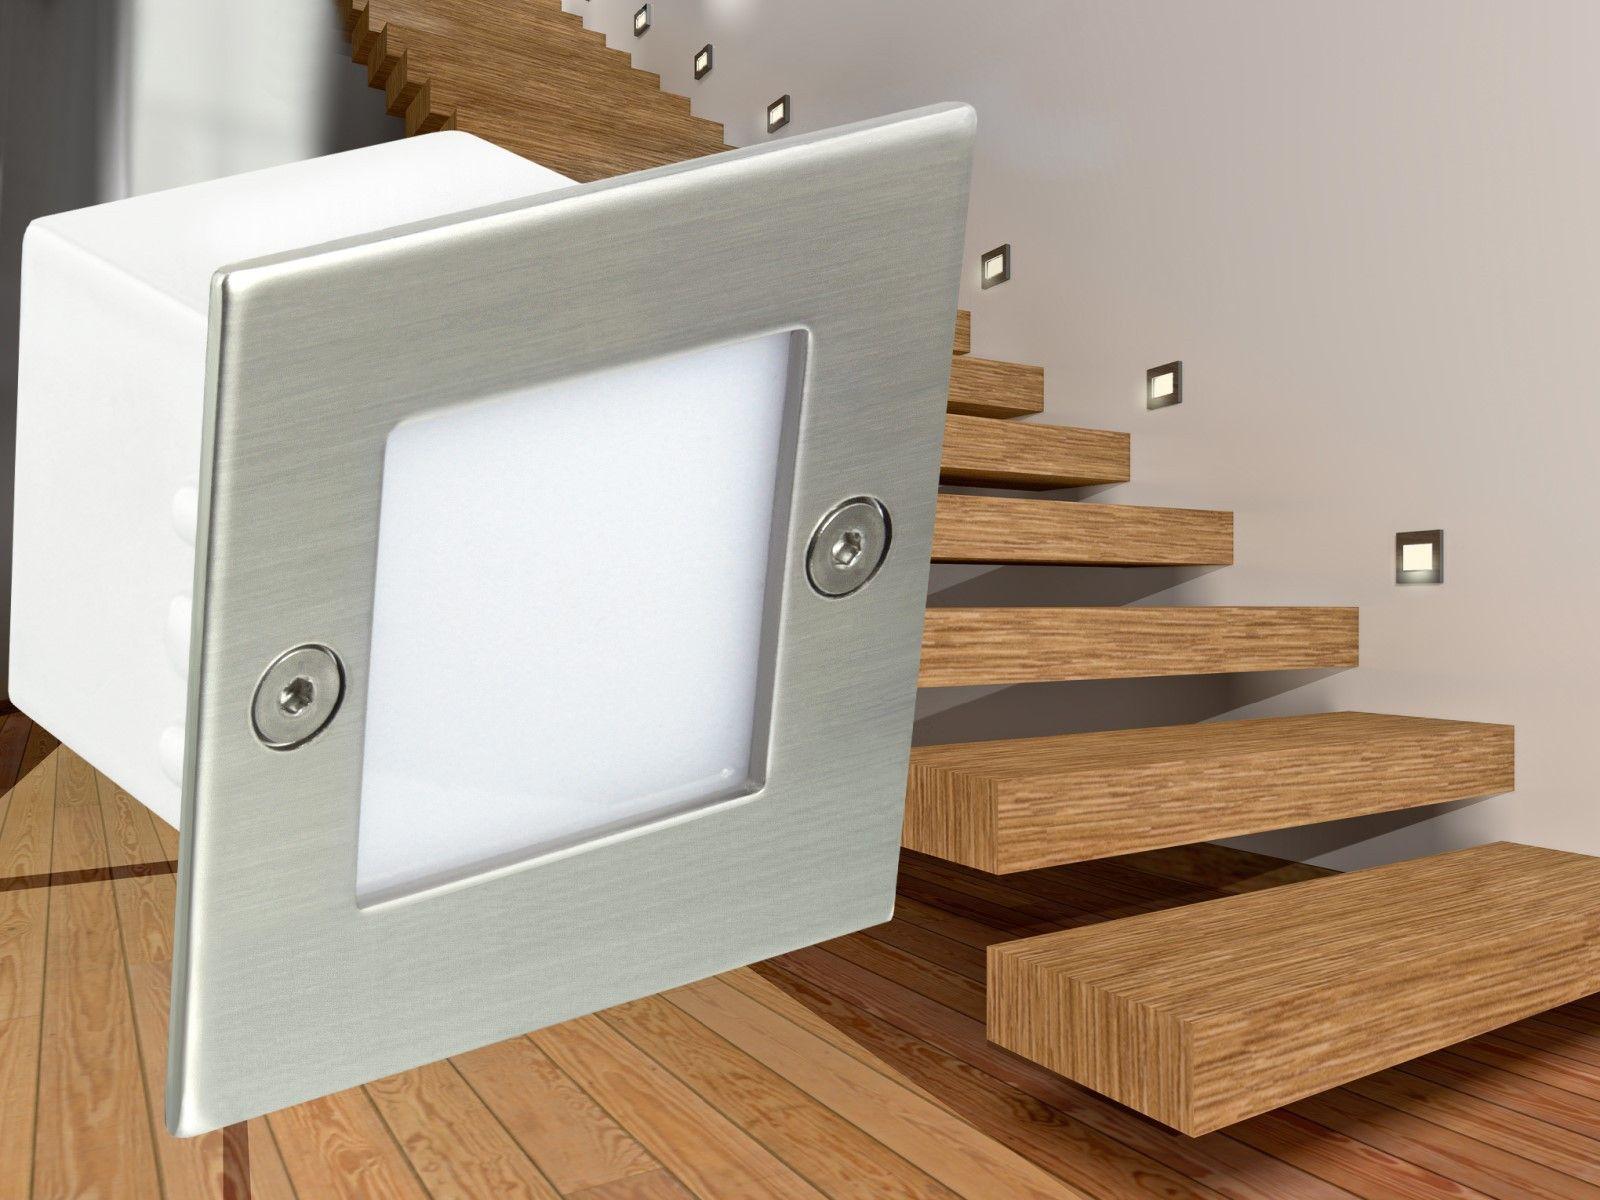 LED-Einbauleuchte Boden Treppenleuchte B04, 0,8W 230V, Edelstahl ...